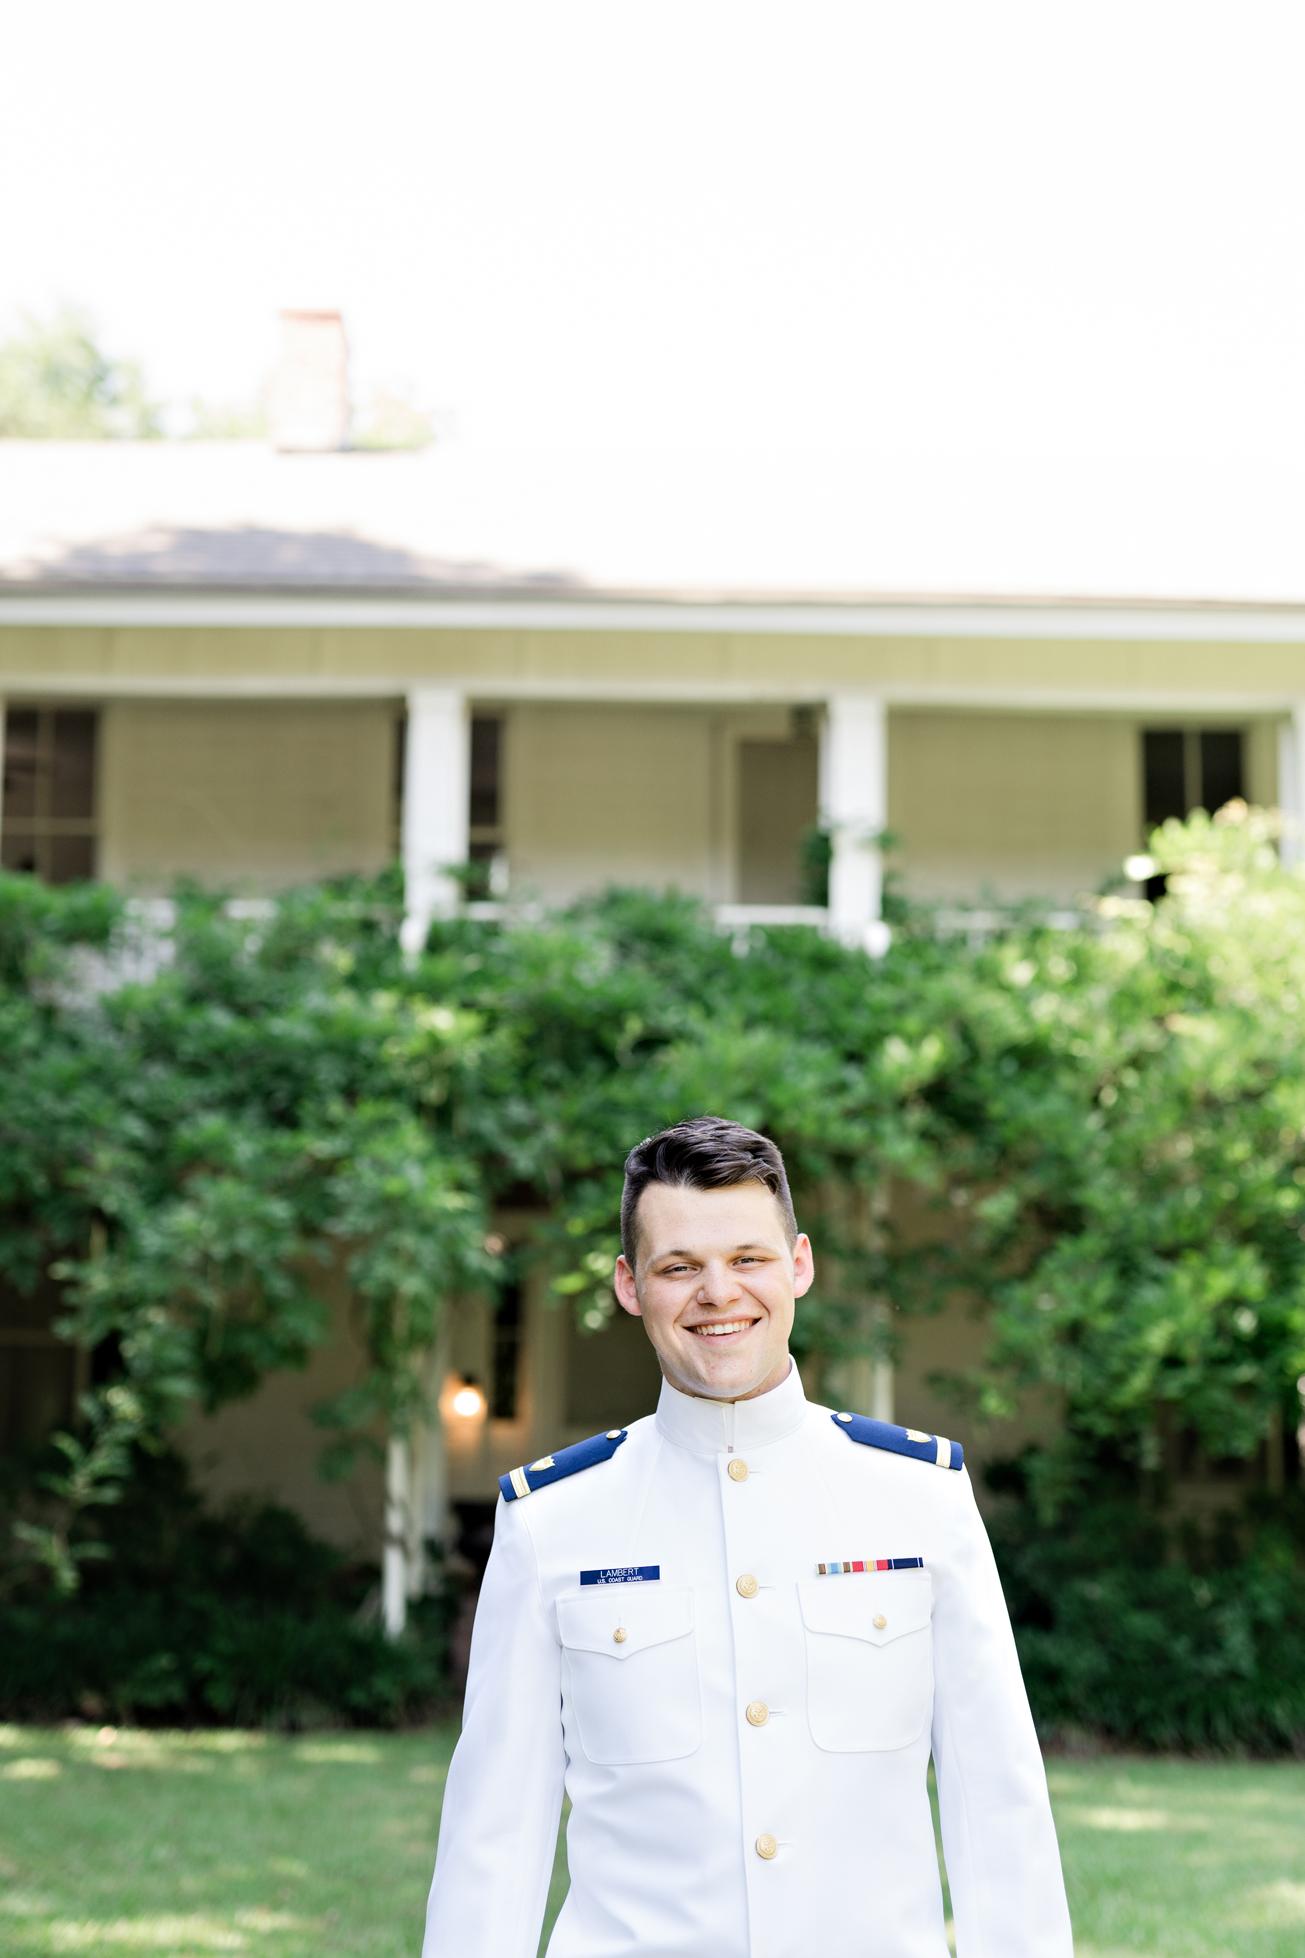 Alabama-Photographers-Nick-Drollette-Wedding-Photography-107.jpg